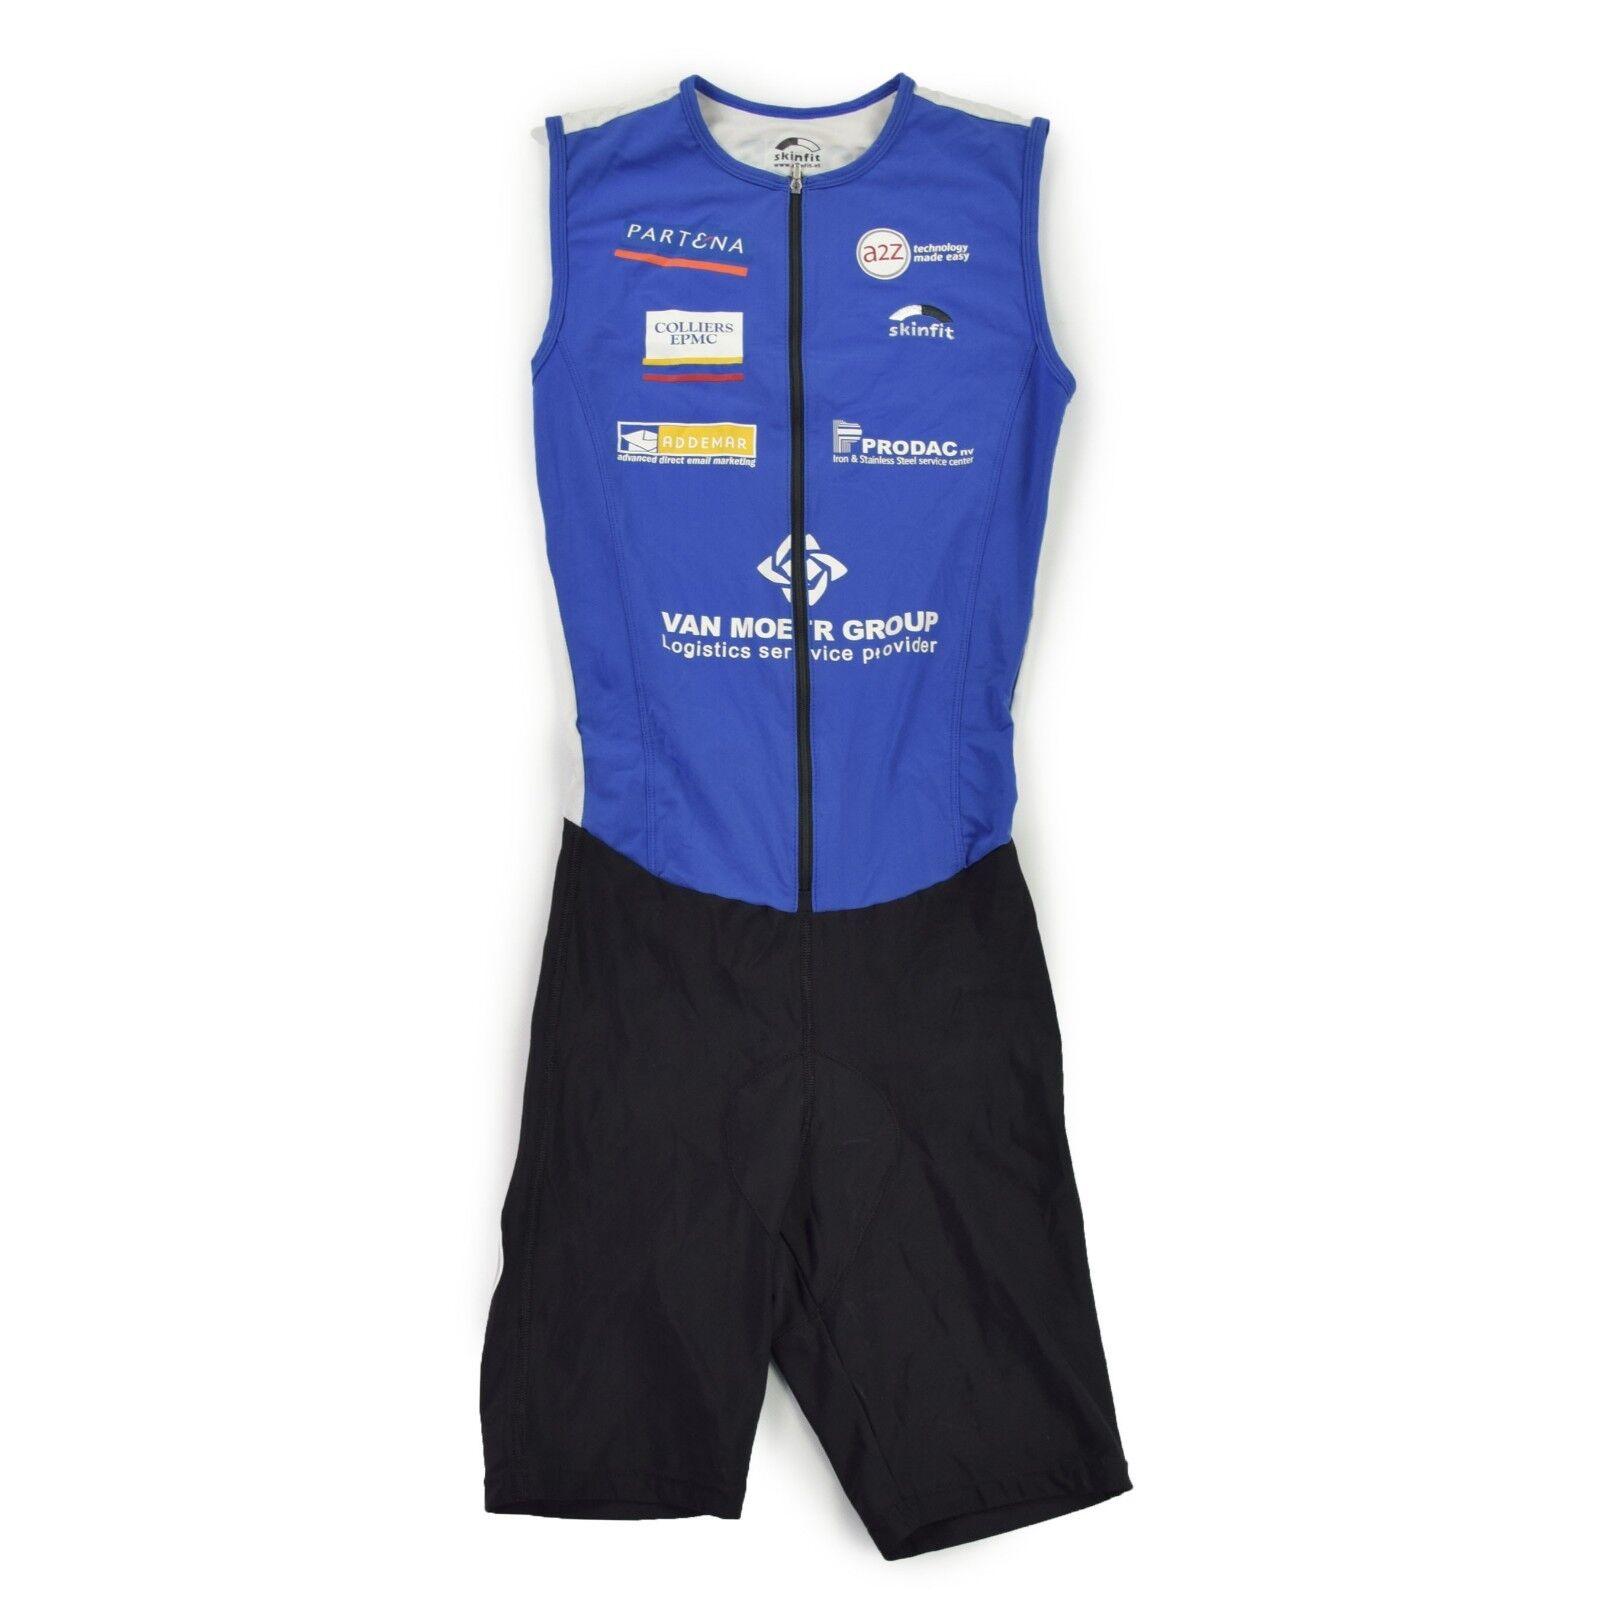 SKINFIT Triatlon Anzug Gr. L SUIT Einteiler Skinsuit Trikot Maillot wie NEU